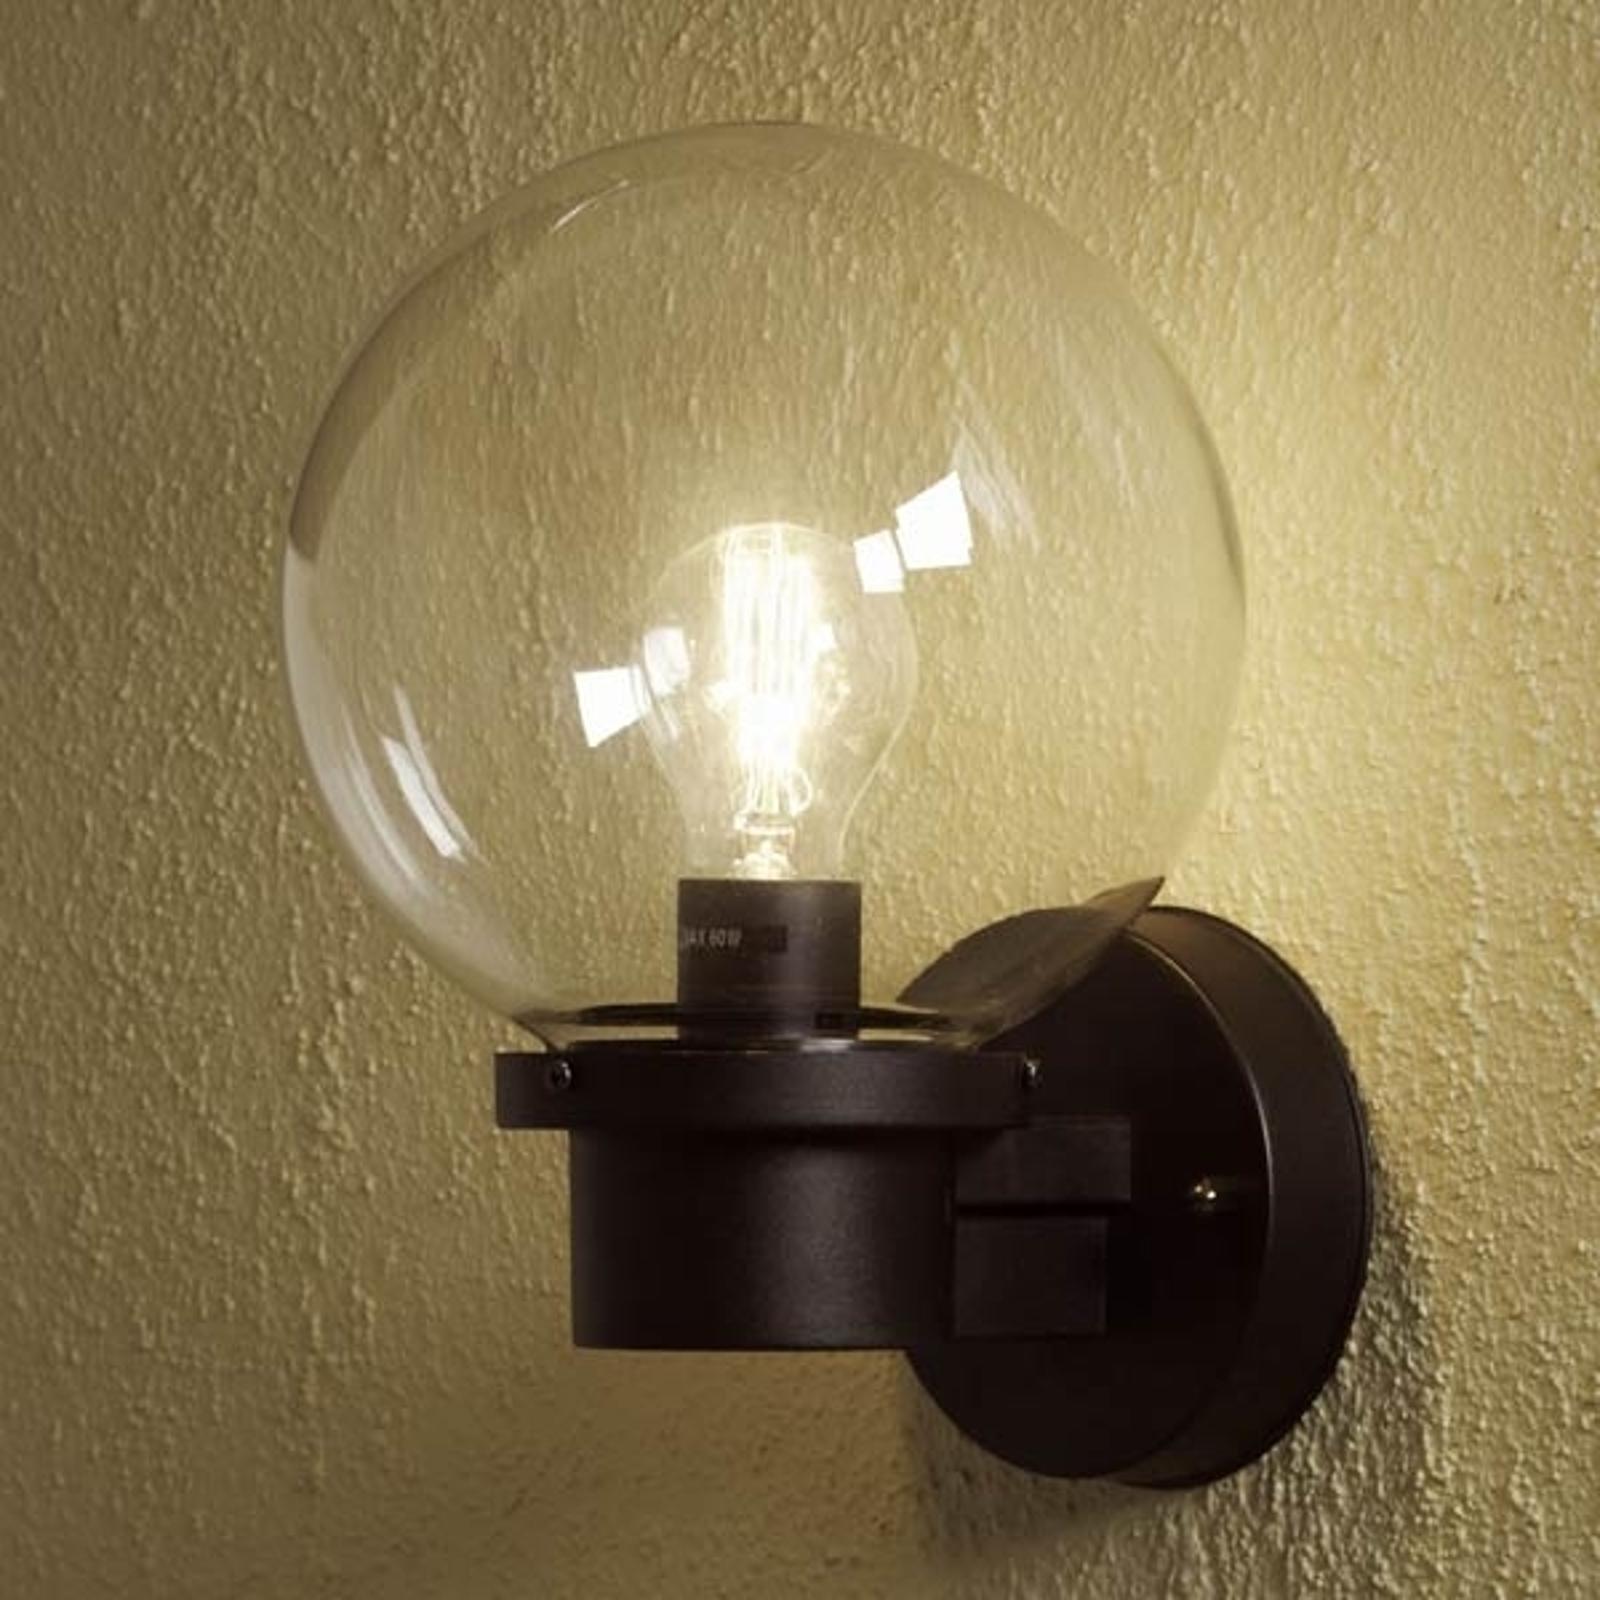 Buitenwandlamp NEMI zonder sensor, zwart